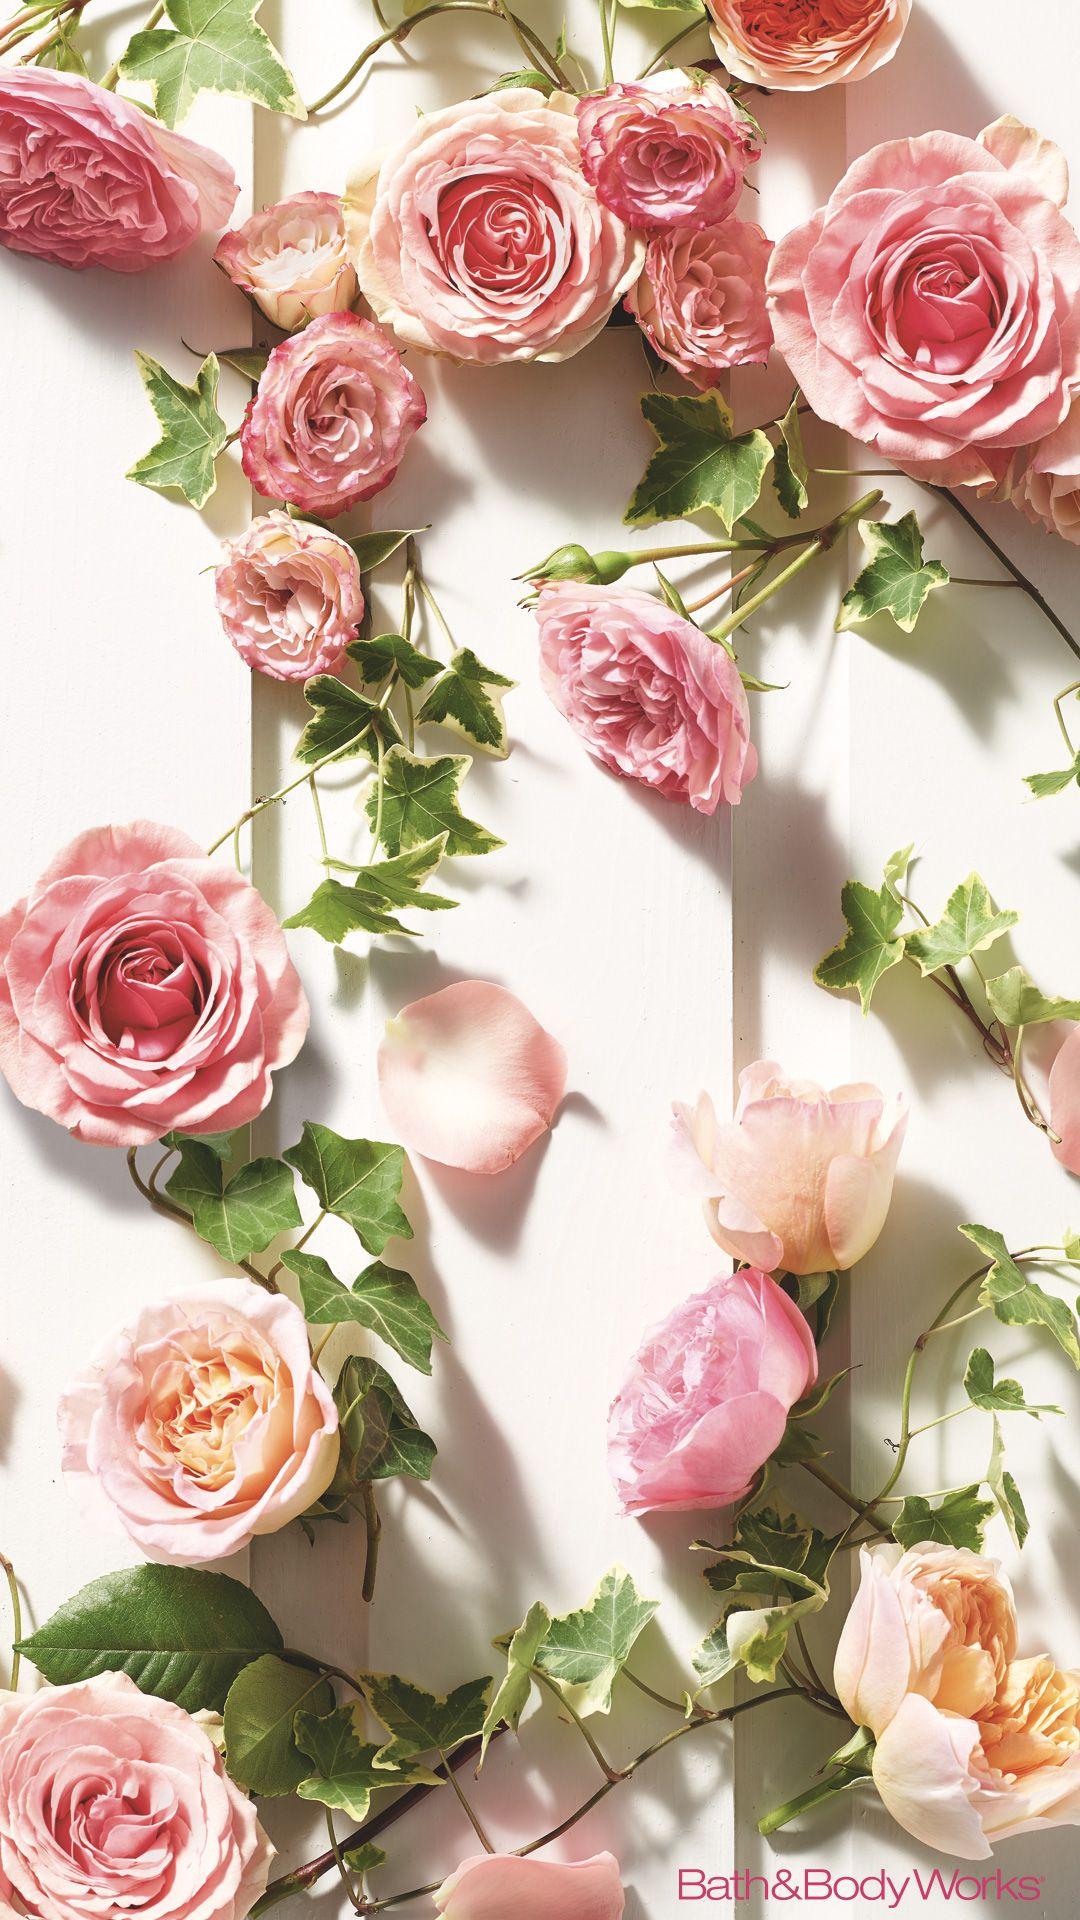 Pink Rose Iphone Wallpaper Secret Bath Body Works Wallpapers